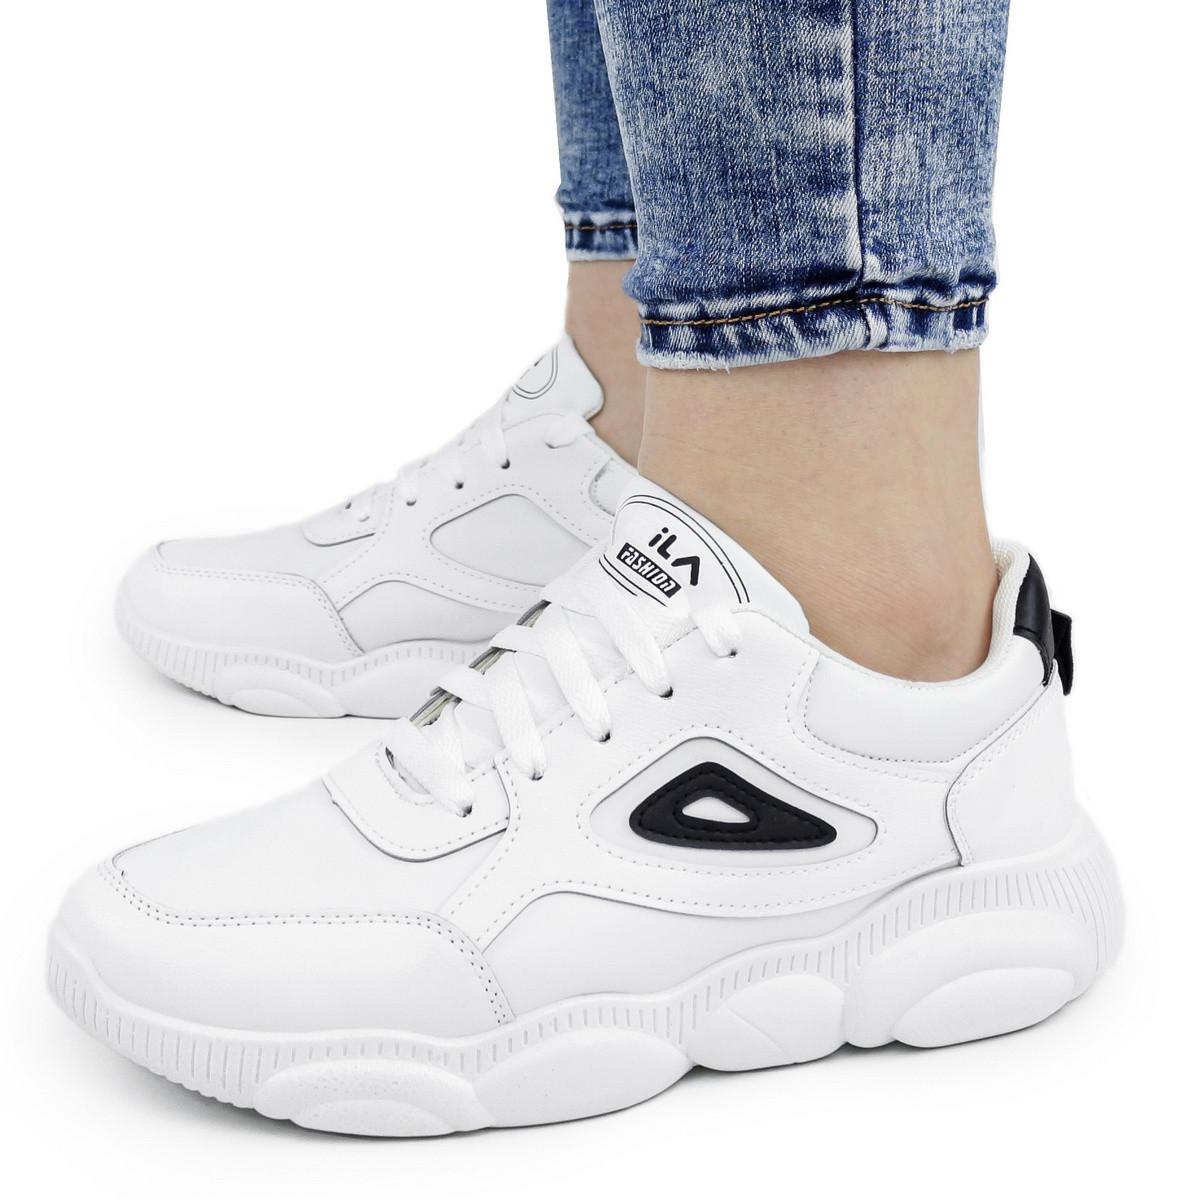 Женские кроссовки Dual ILA Fashion белые весна-осень 41 р. - 26 см (1341603274)